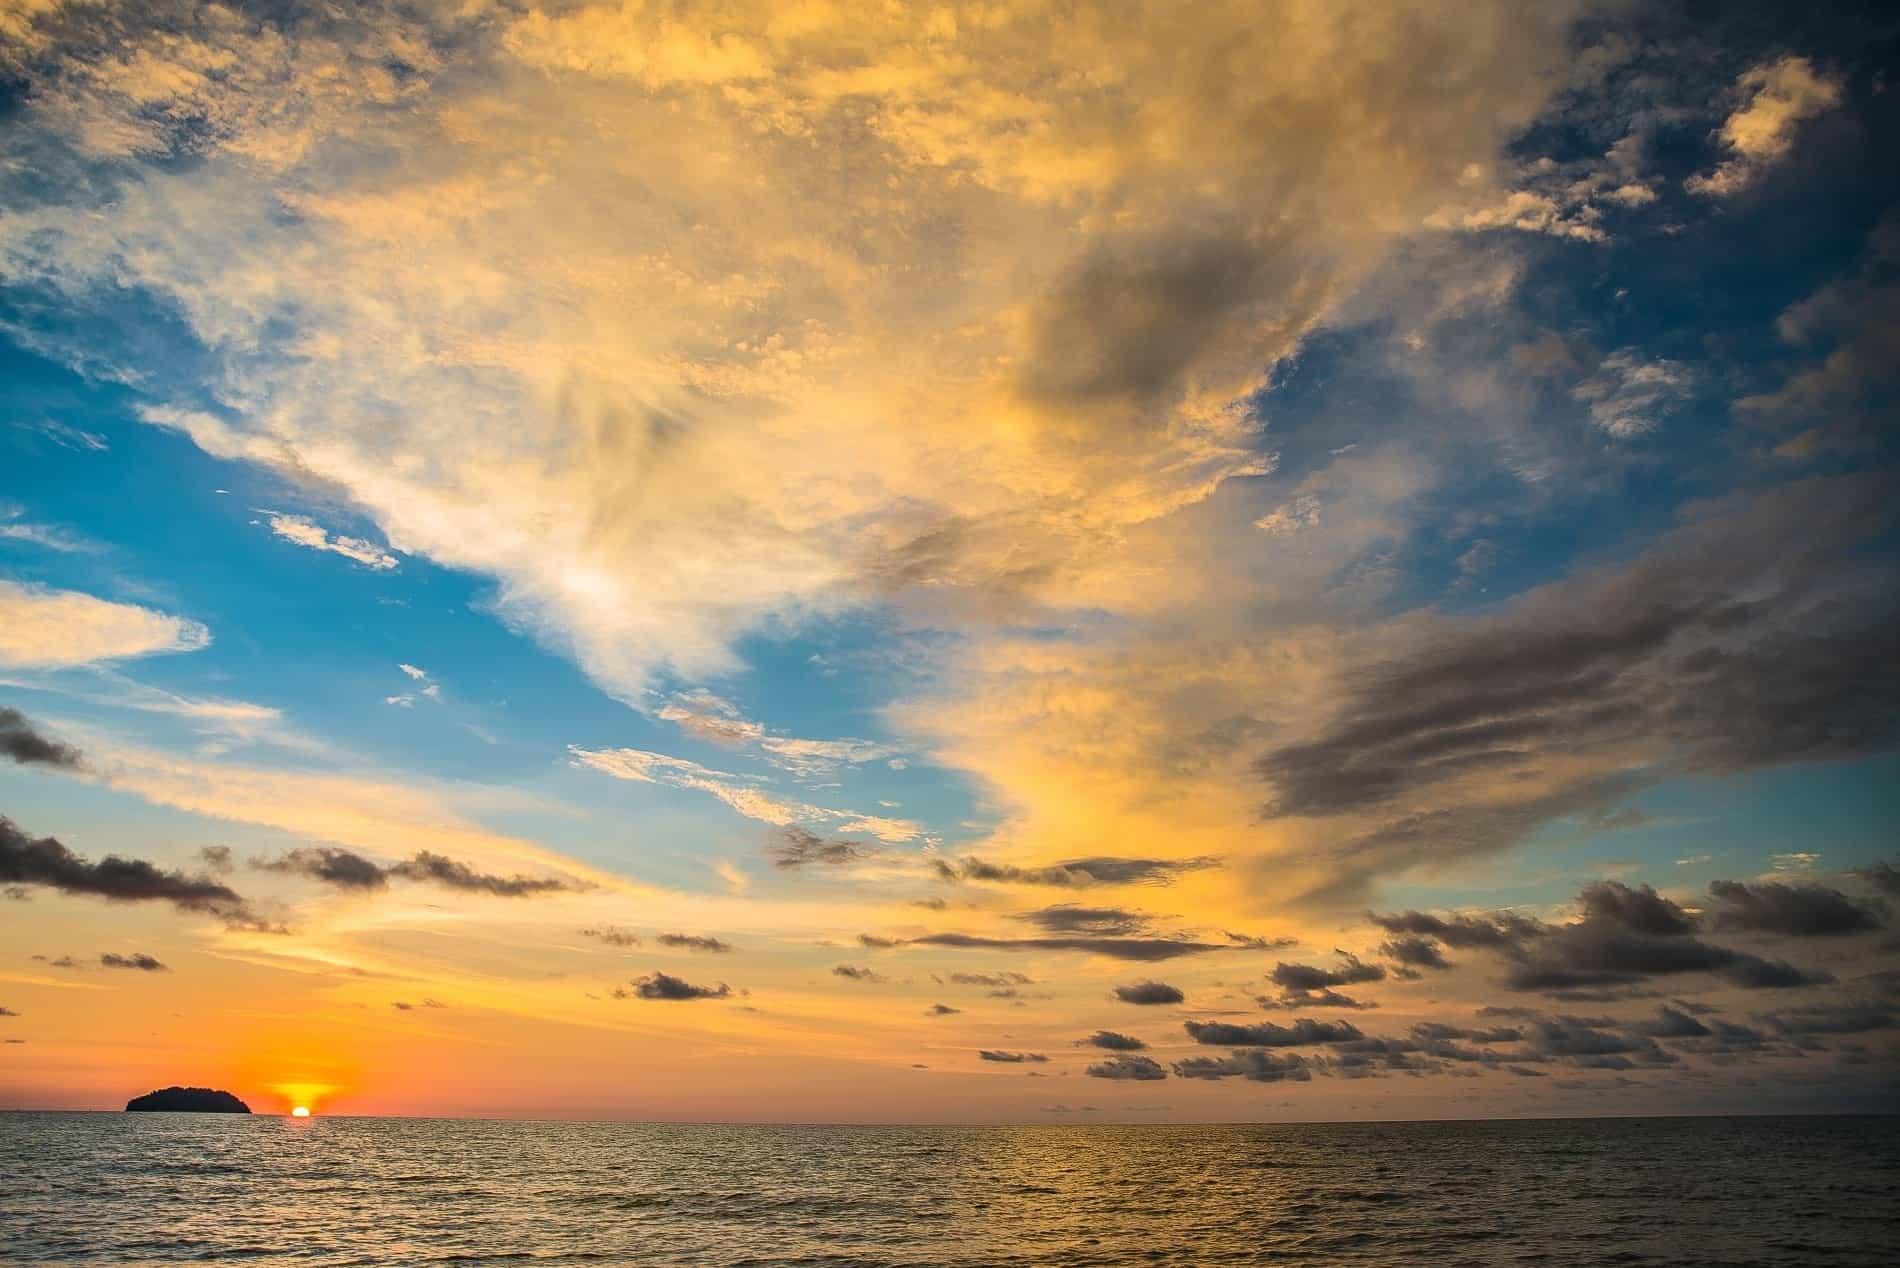 Free Picture  Sunrise  Cloud  Sunshine  Pacific  Sunlight